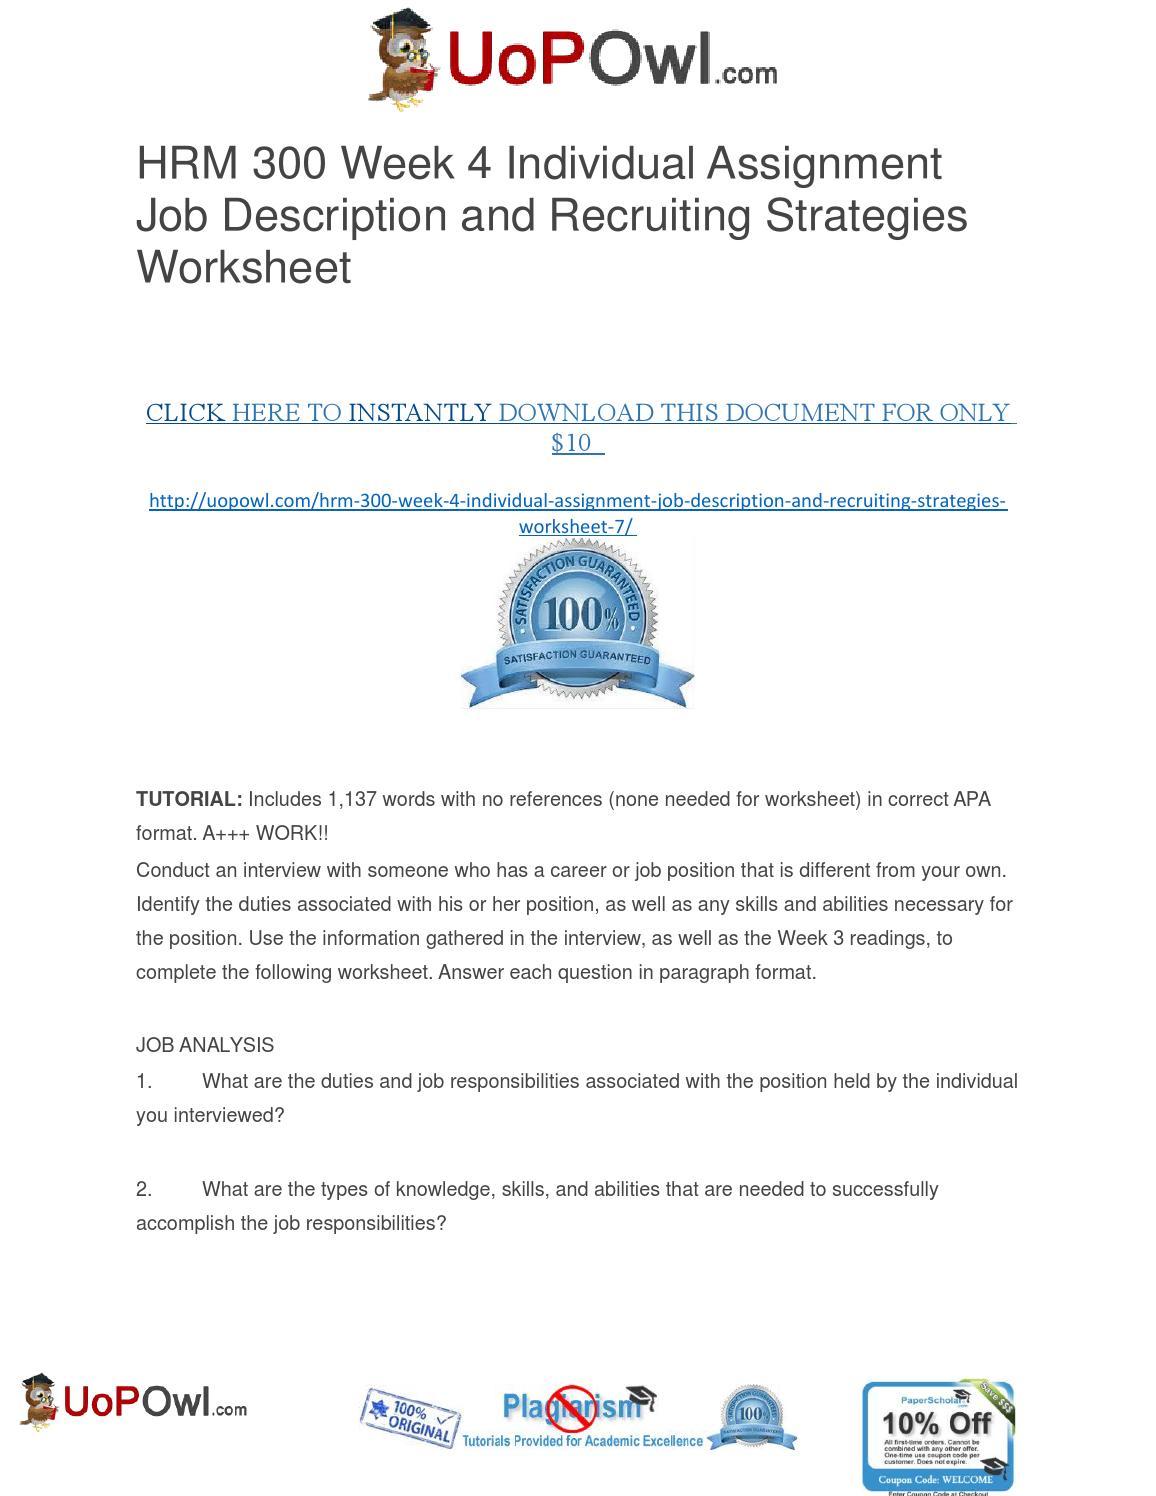 job description and recruiting strategies worksheet hrm 300 Contents human resource management 3 staffing 3 job analysis 3  questionnaires 4 interviews  job description and recruiting strategies  worksheet essay.